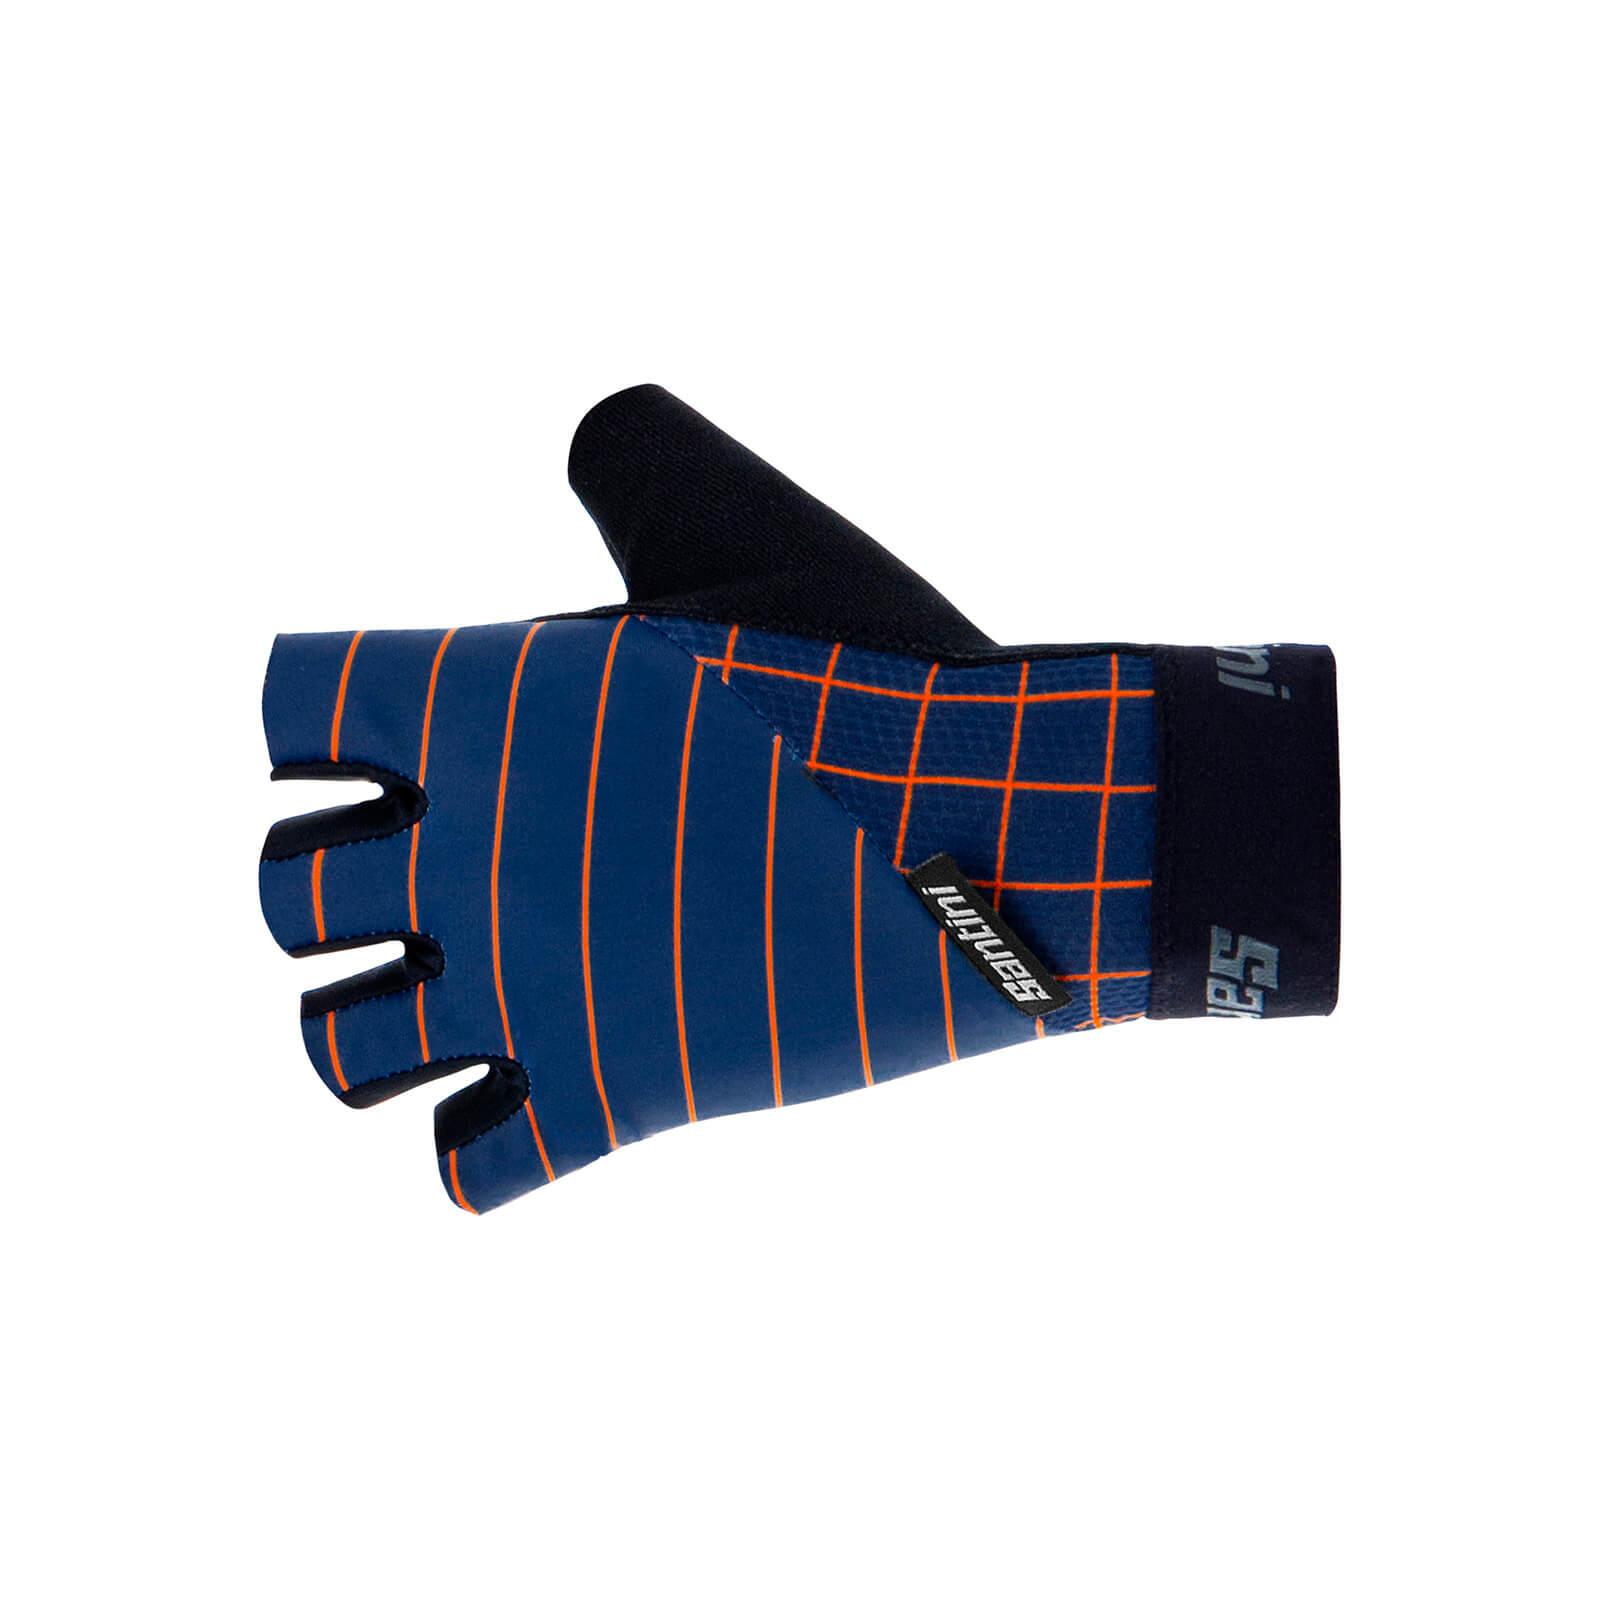 Santini Dinamo Gel Gloves - L - Nautica Blue